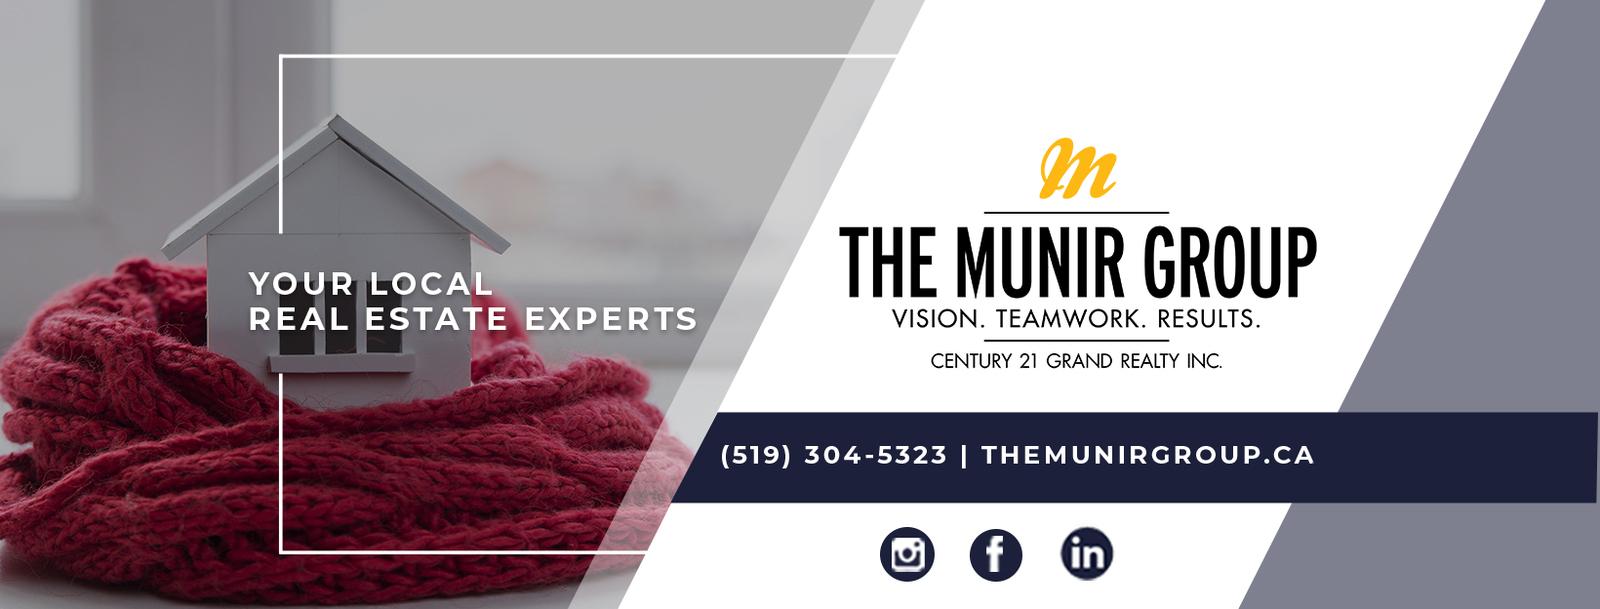 The Munir Group Real Estate Simcoe